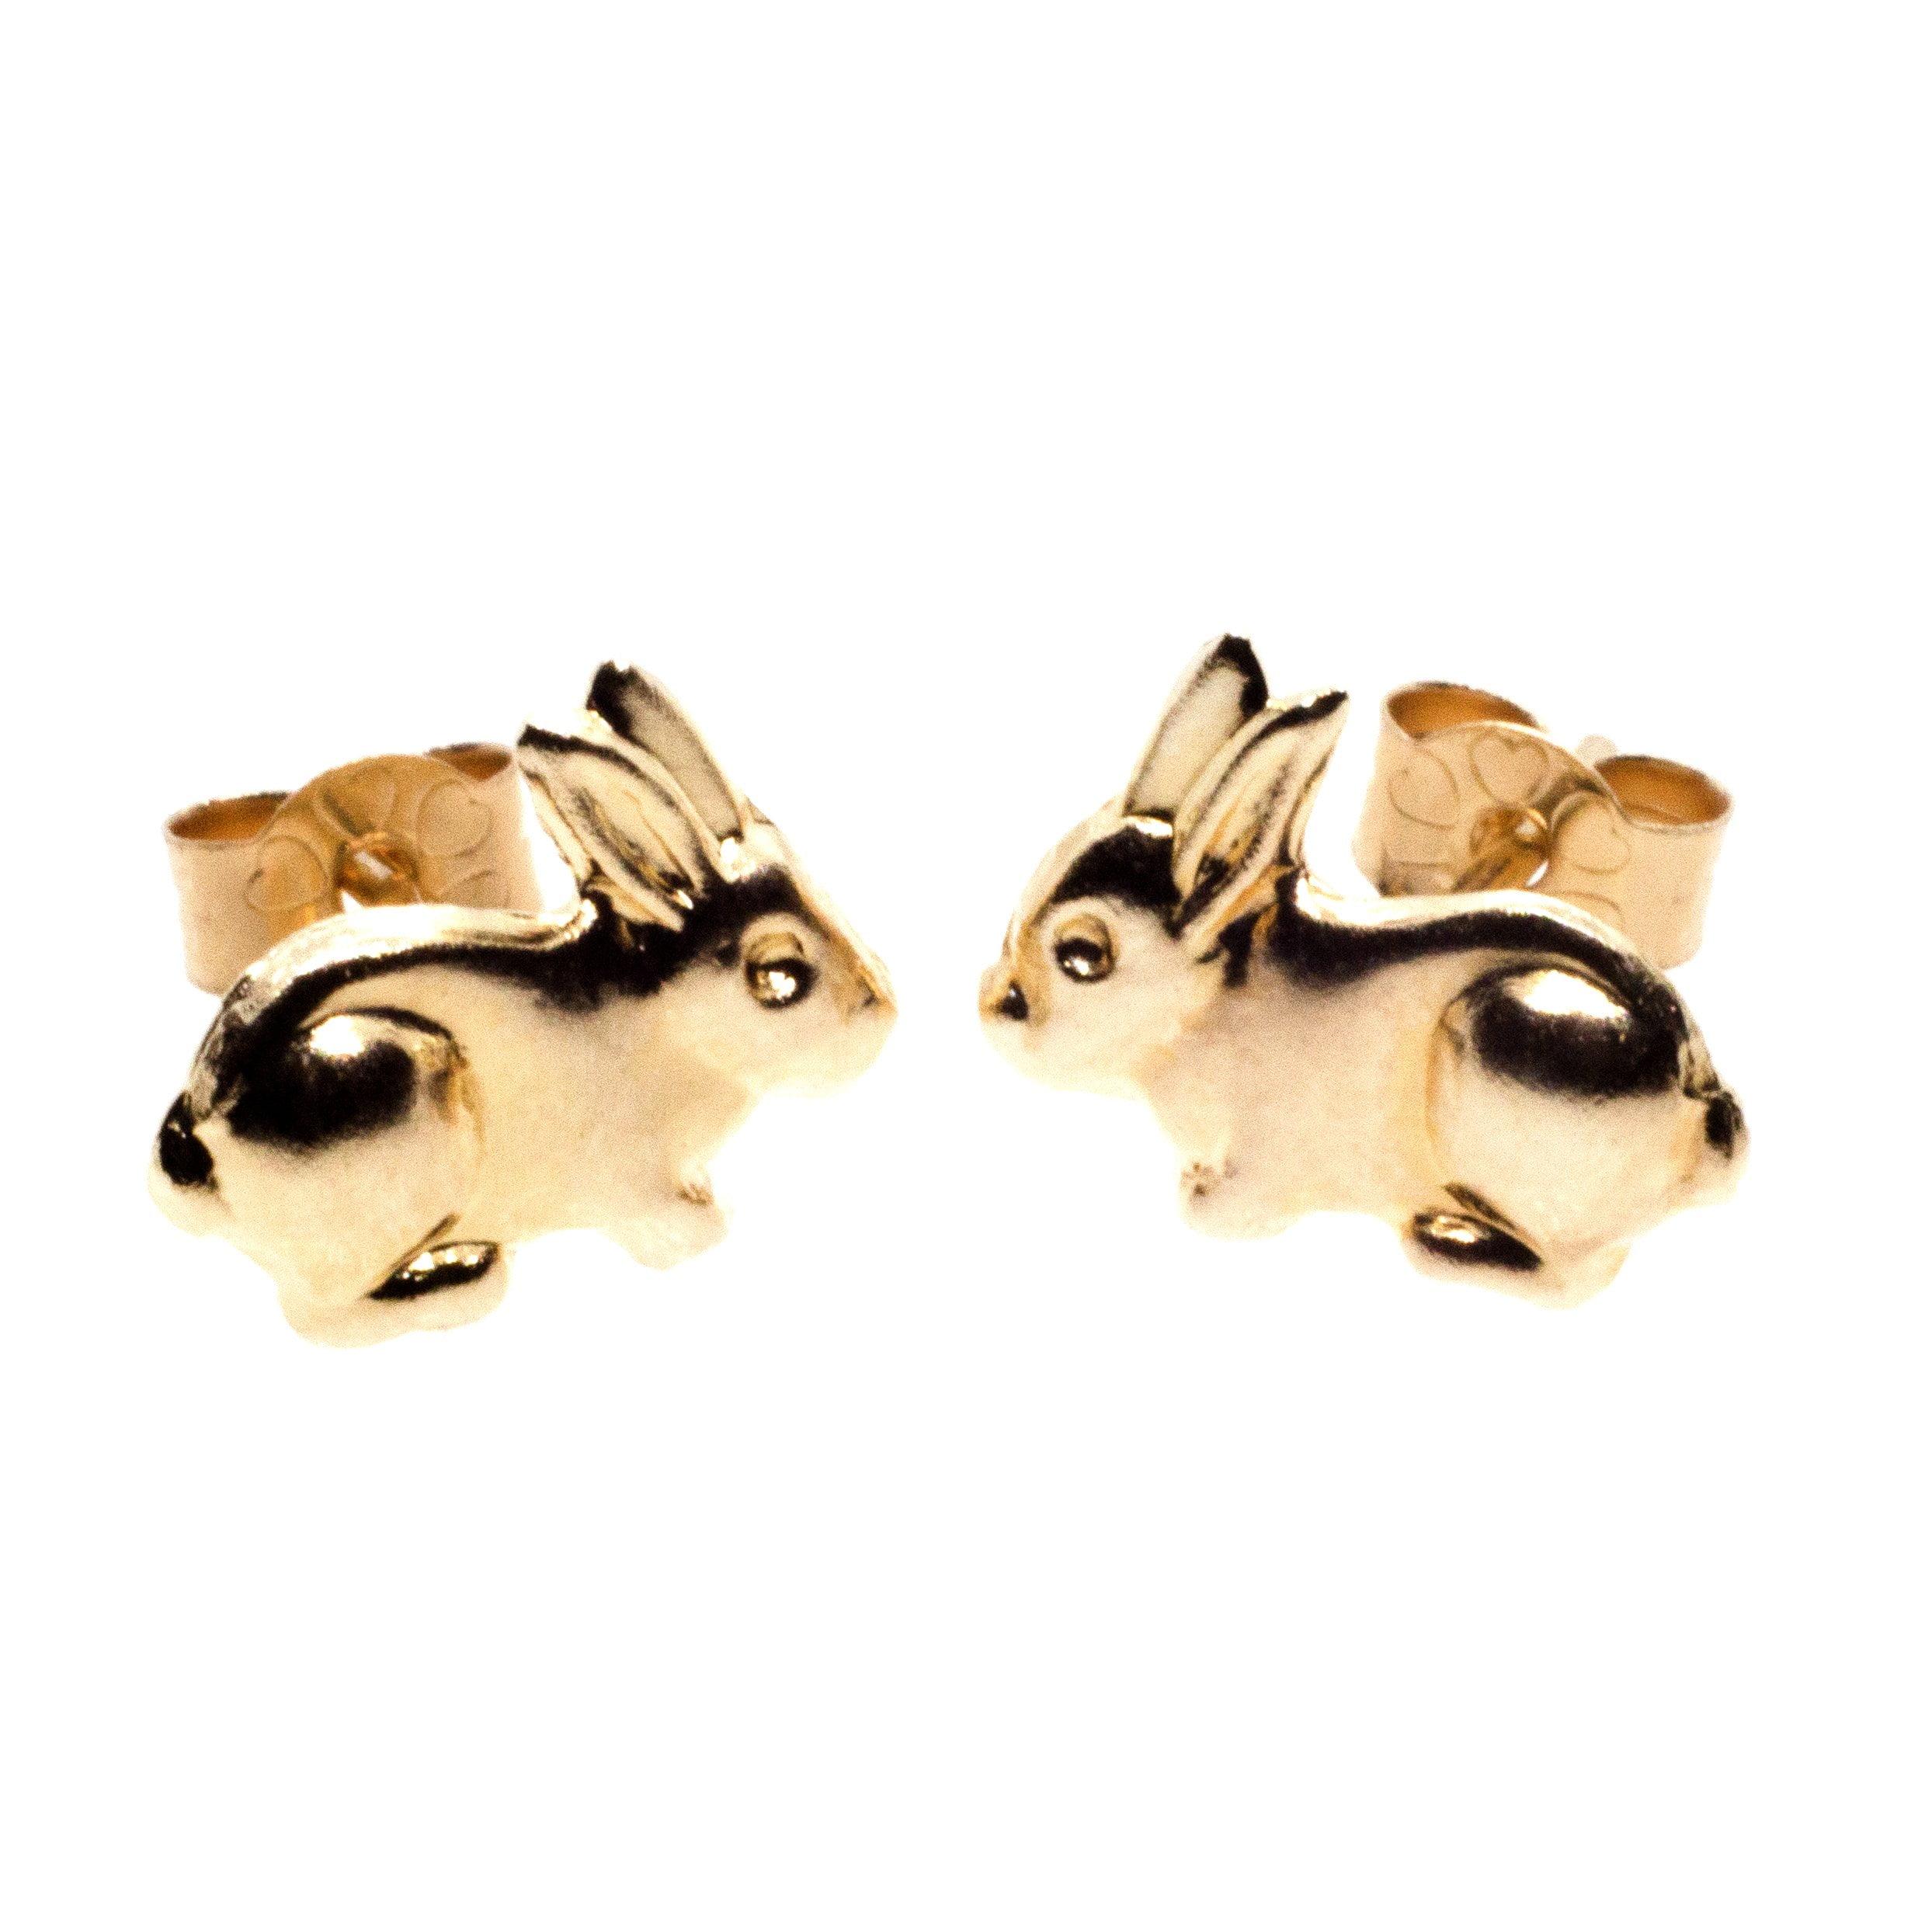 9ct gold rabbit earrings